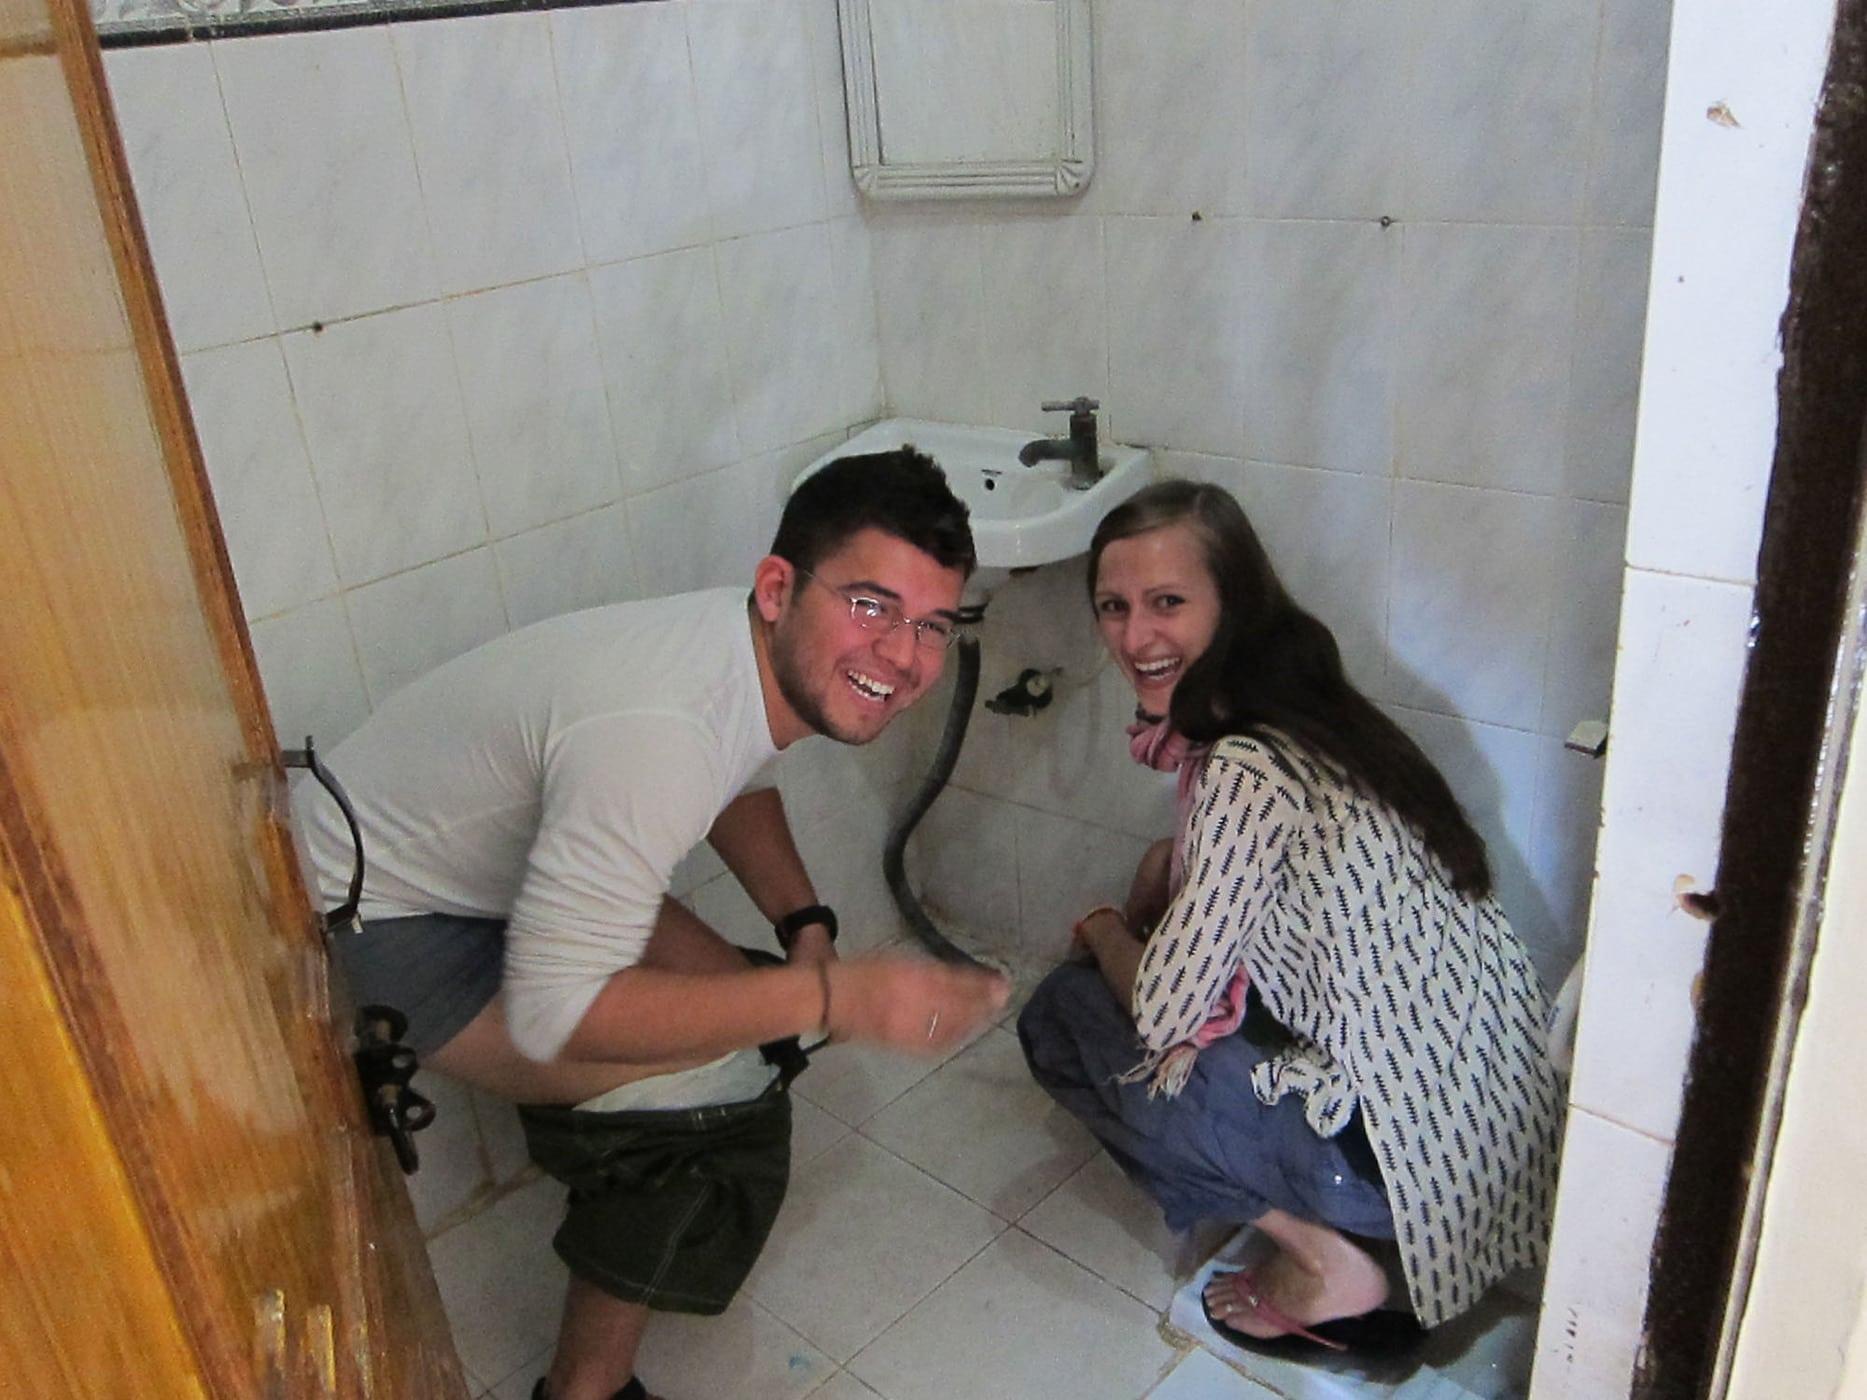 Teaching Jaime to use the squat toilet in Mathura, India.